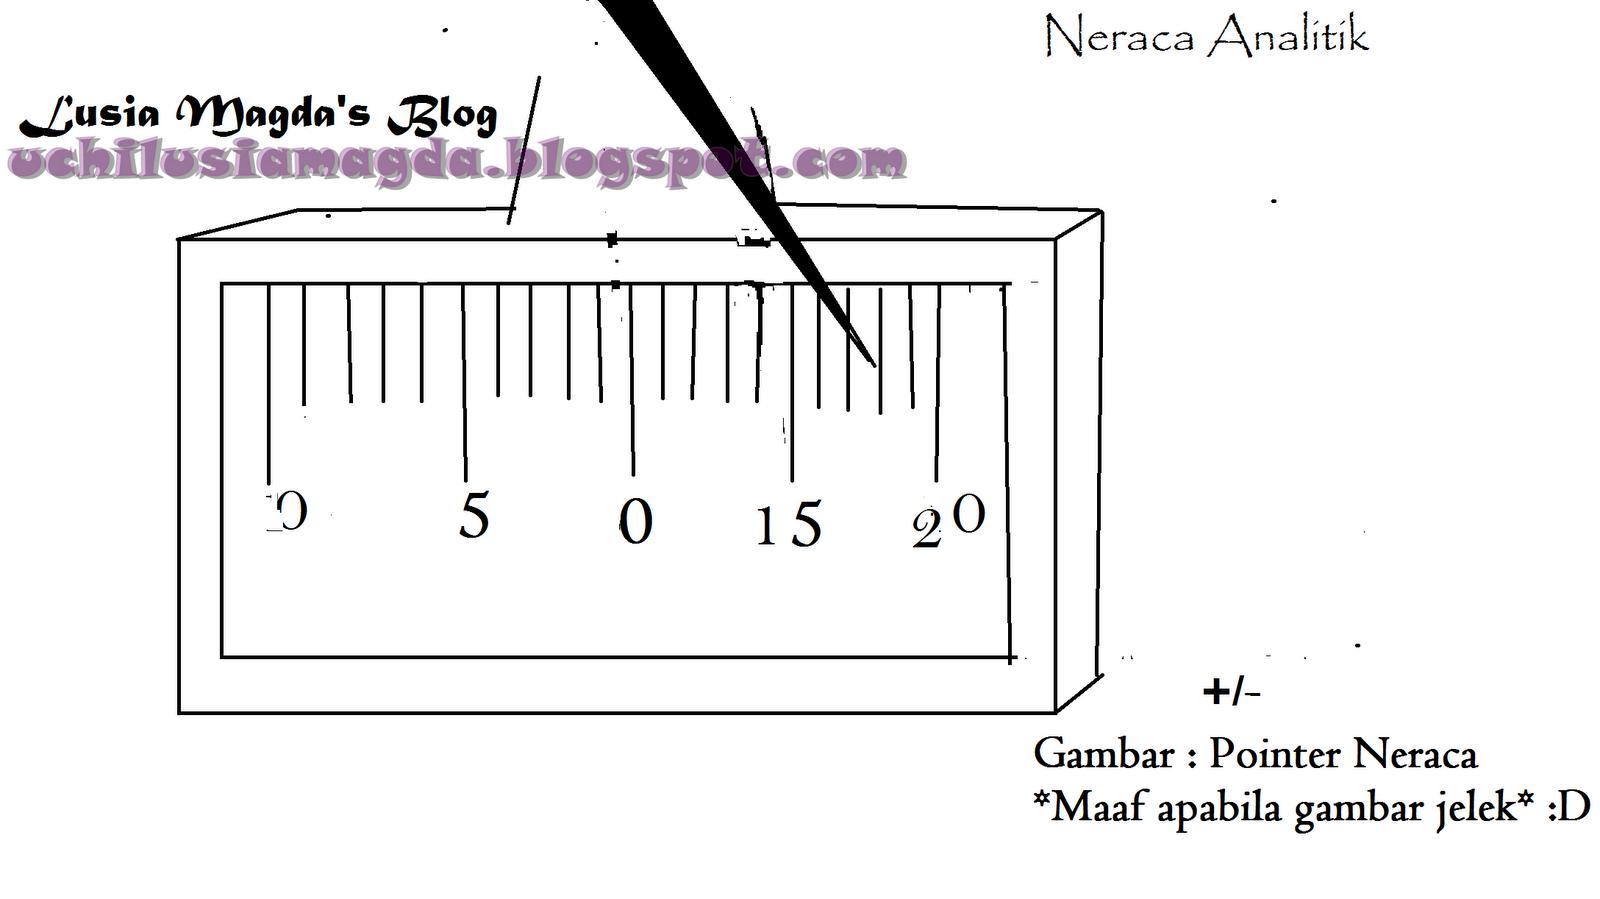 Chemical analyst penimbangan neraca pada gambar disamping pointer berhenti di sebelah kiri titik 95 untuk itu diperlukan mata yang jeli untuk menentukan l pada neraca ccuart Images